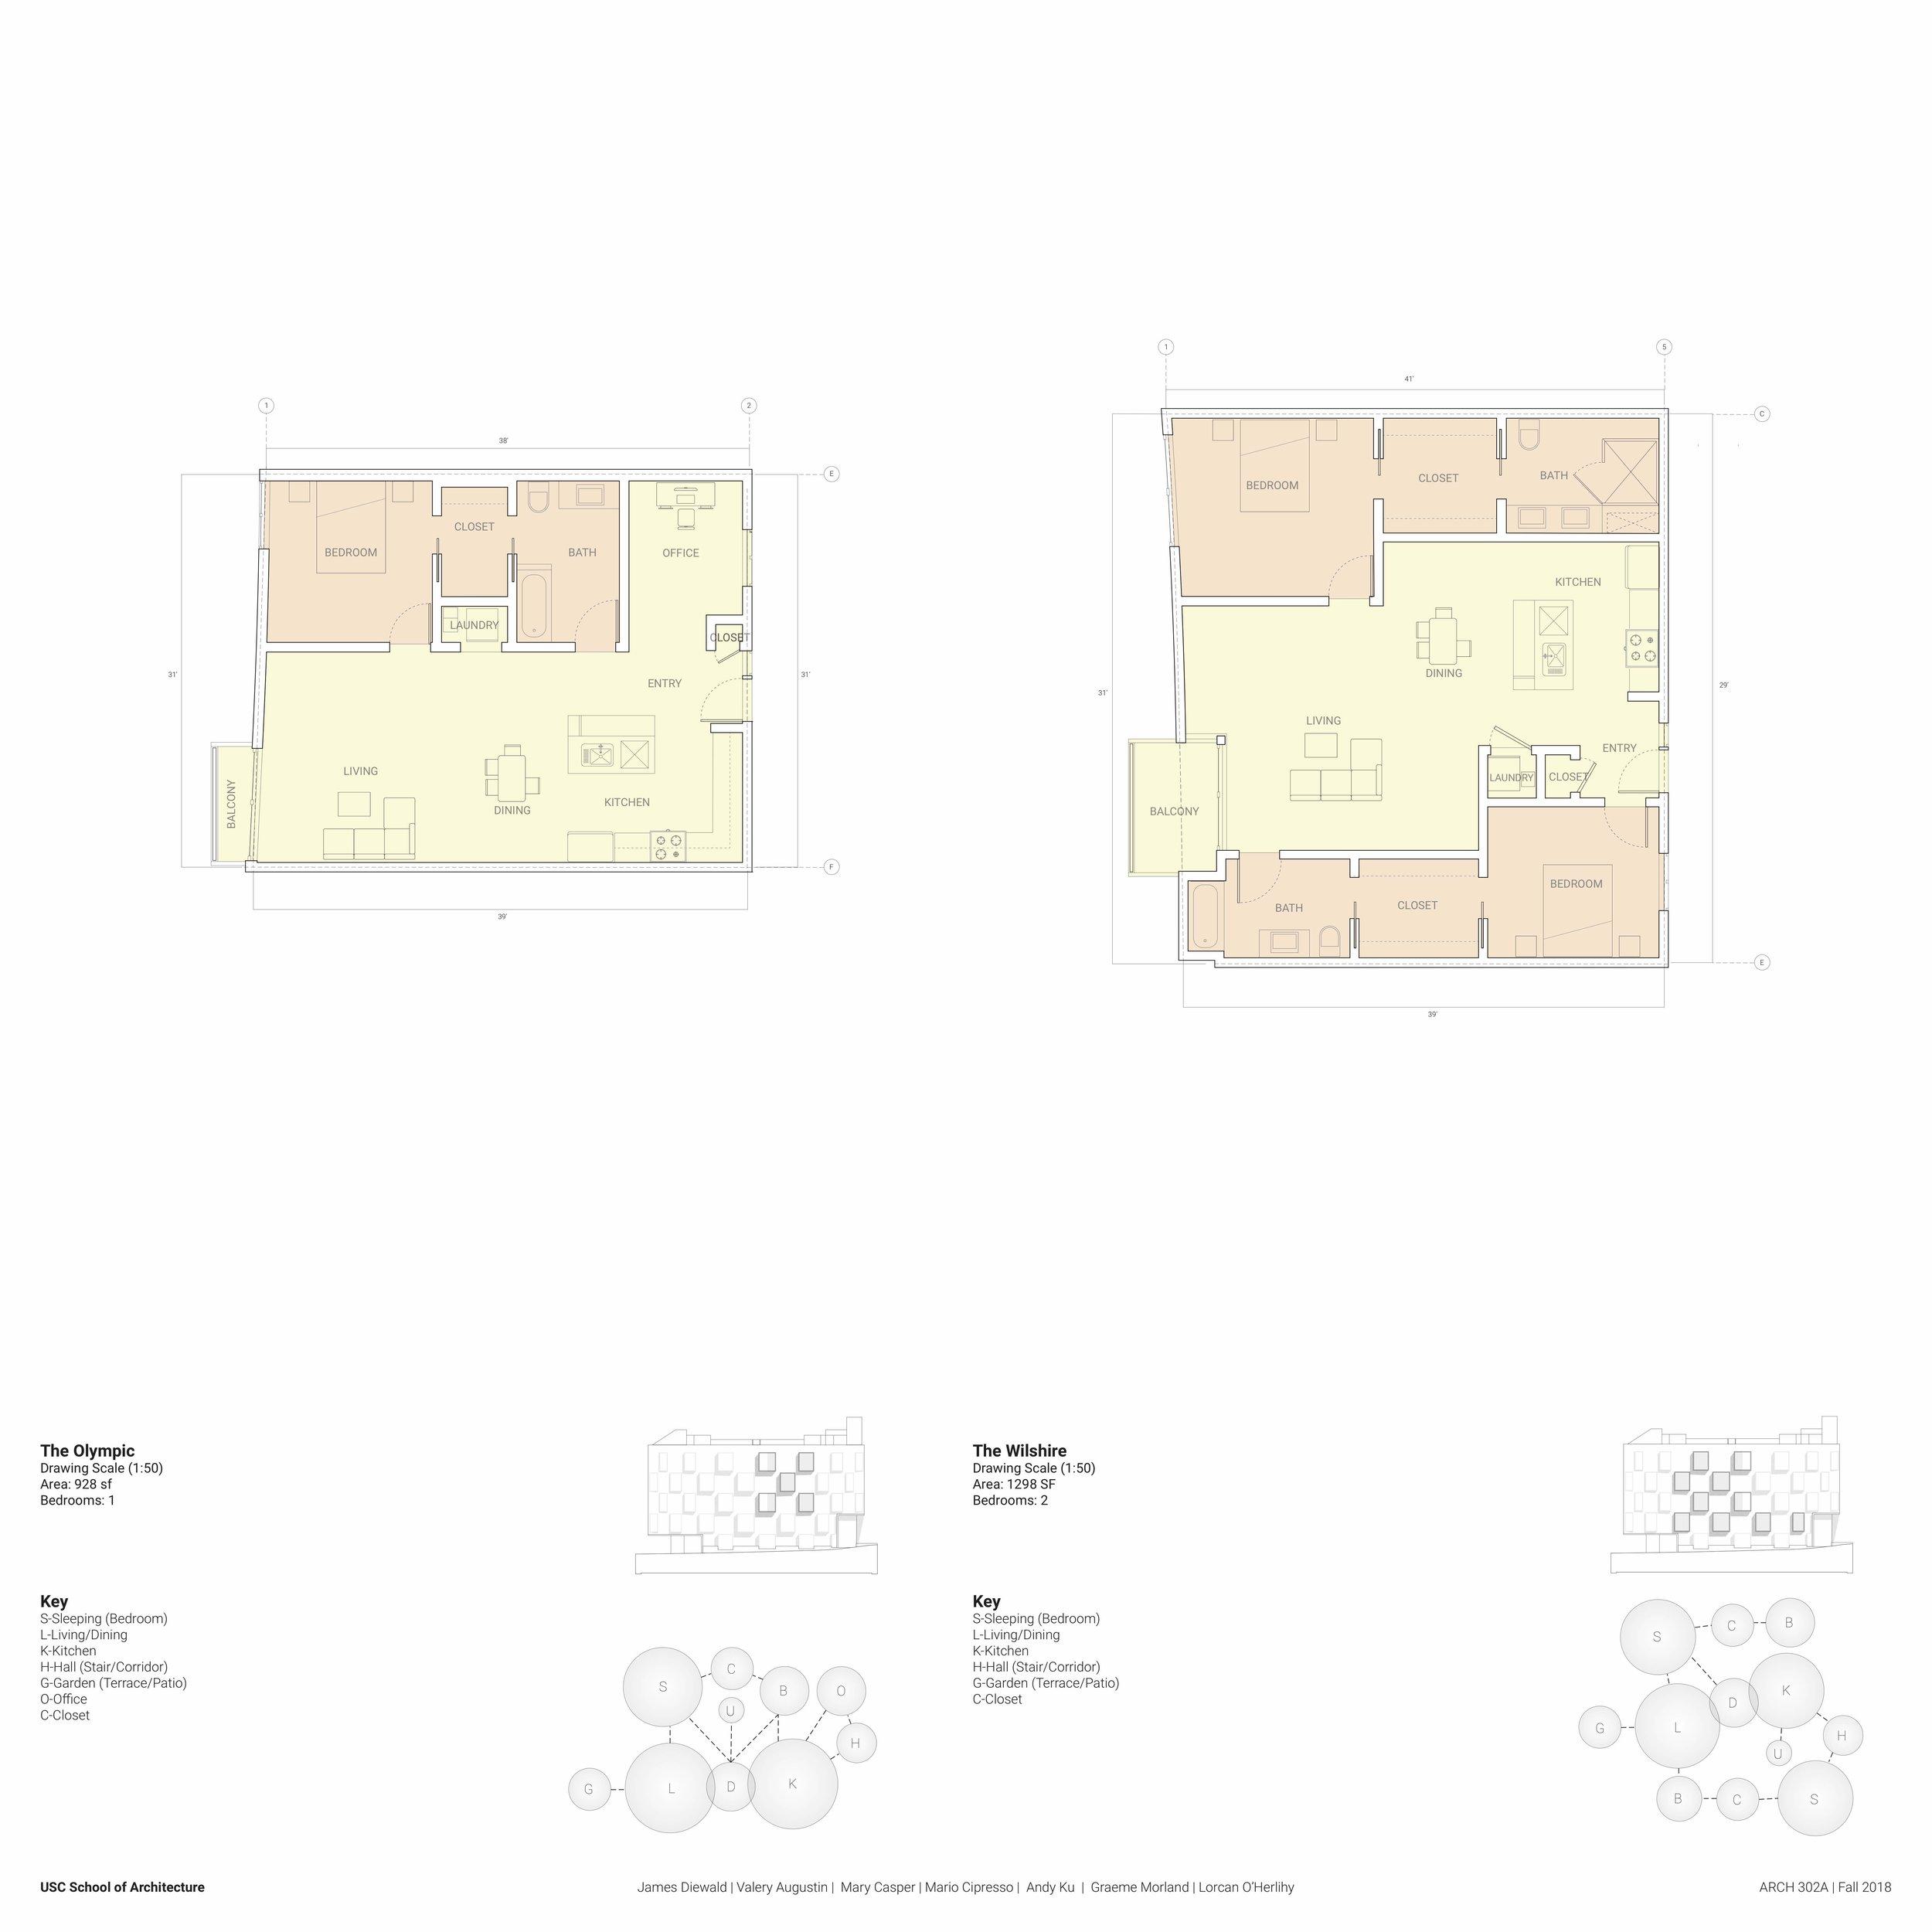 302A-Typology_Analysis_Mariposa 6.jpg